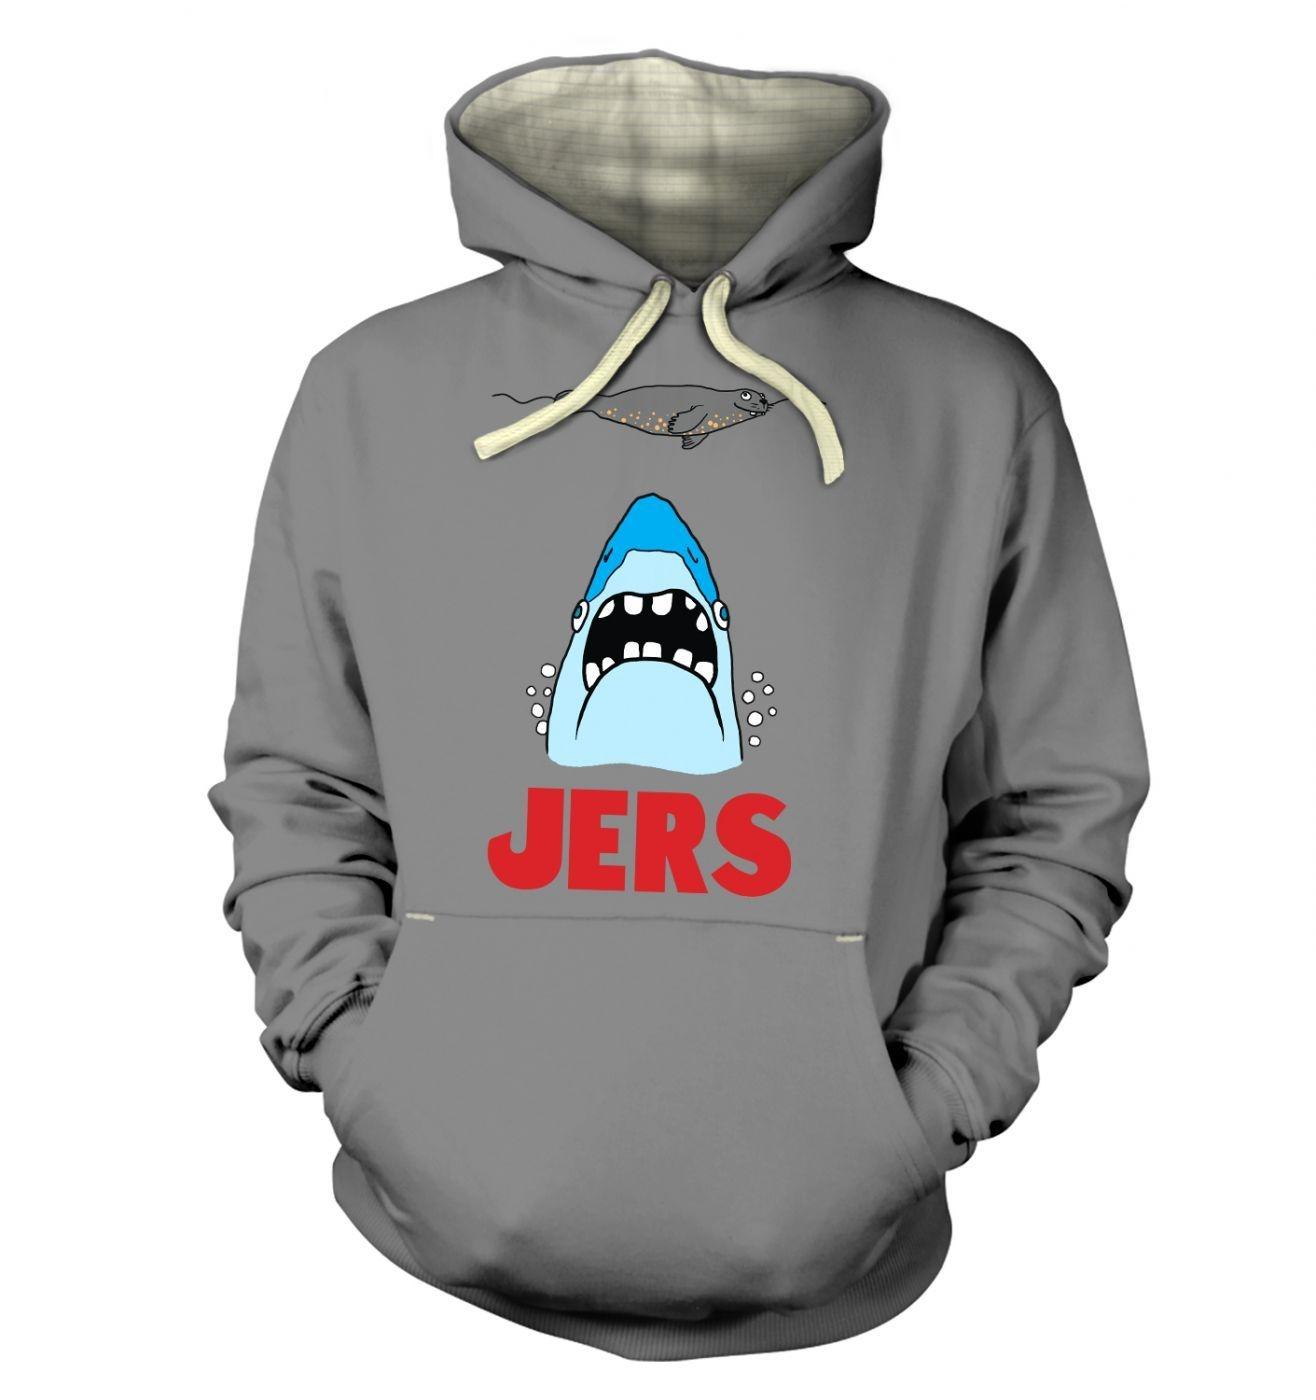 Jers hoodie (premium)